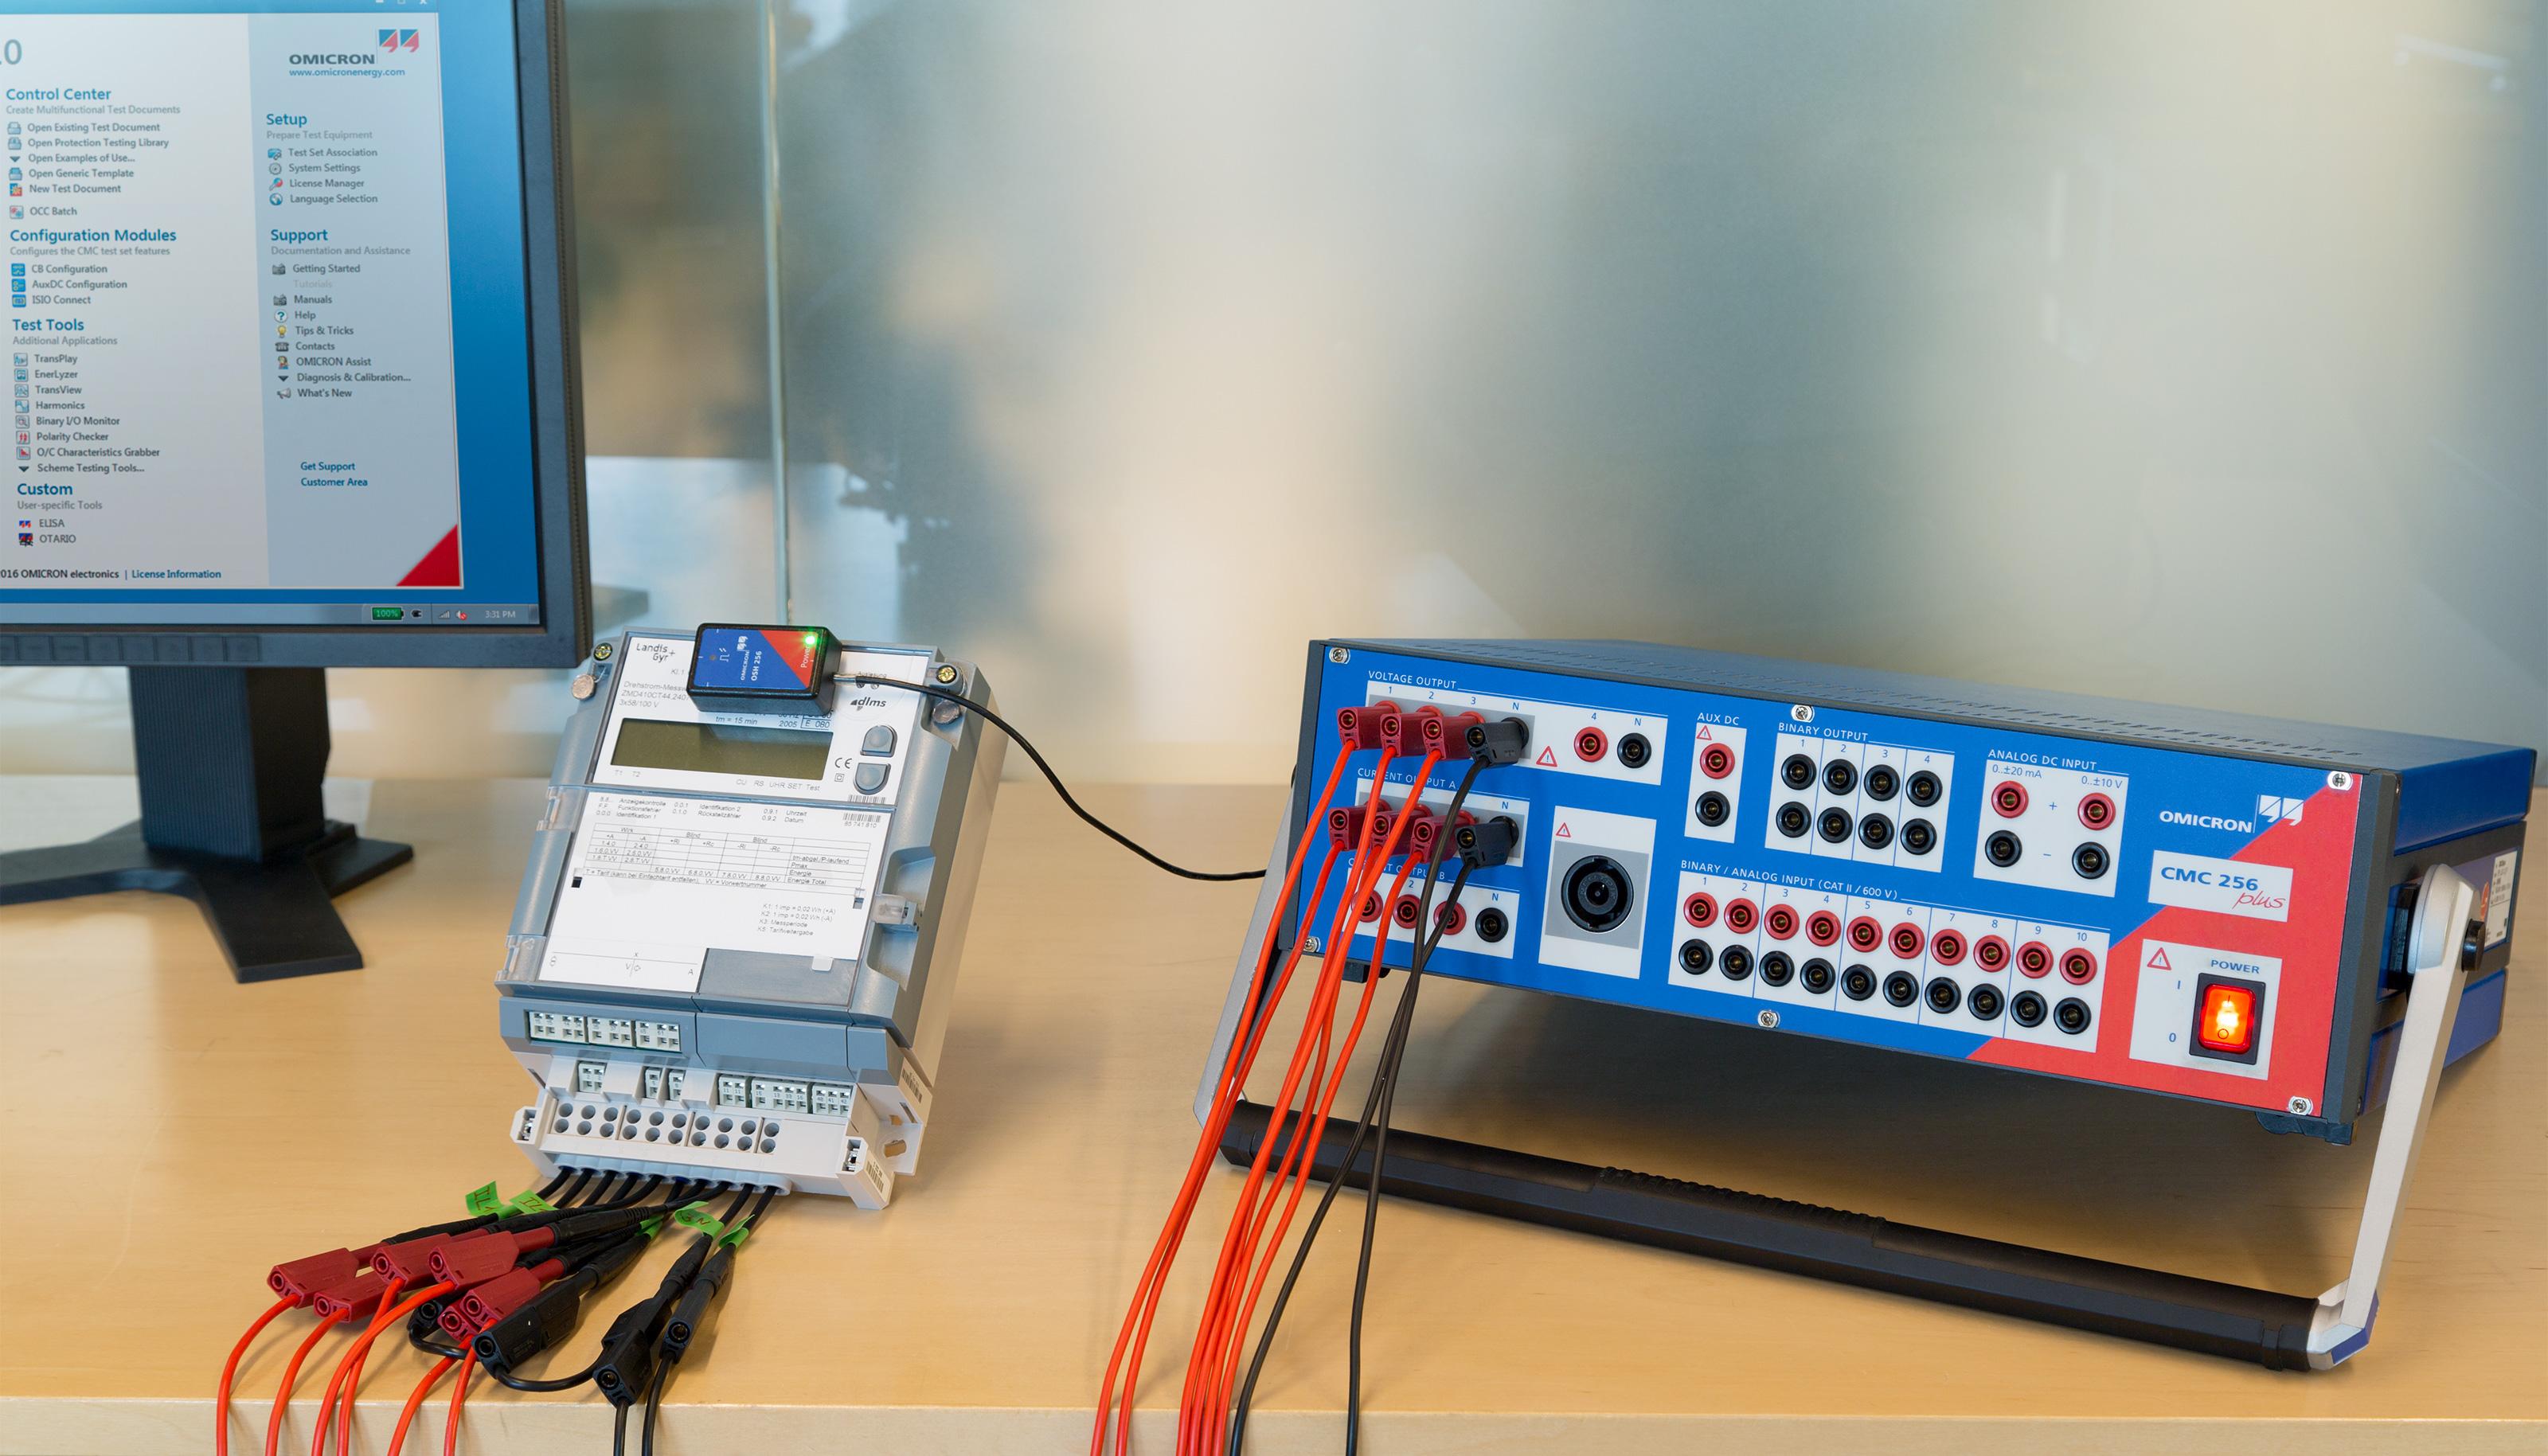 Measurement Equipment Meter Testing Cmc Tu Benefit in addition Measurement Equipment Meter Testing Cmc Tu Benefit also Omicron Relay Test Set likewise Measurement Equipment Meter Testing Cmc Tu Benefit also Omicron Cmc Plus Front. on omicron relay test equipment